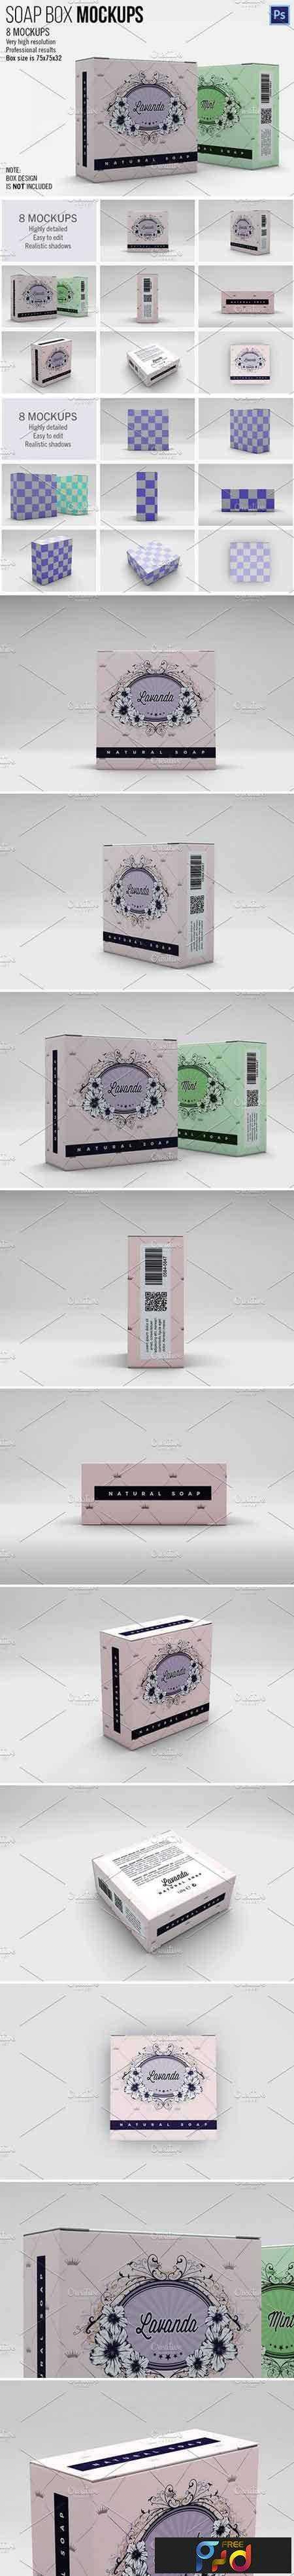 1804169 Soap Box Mockups 2185468 1